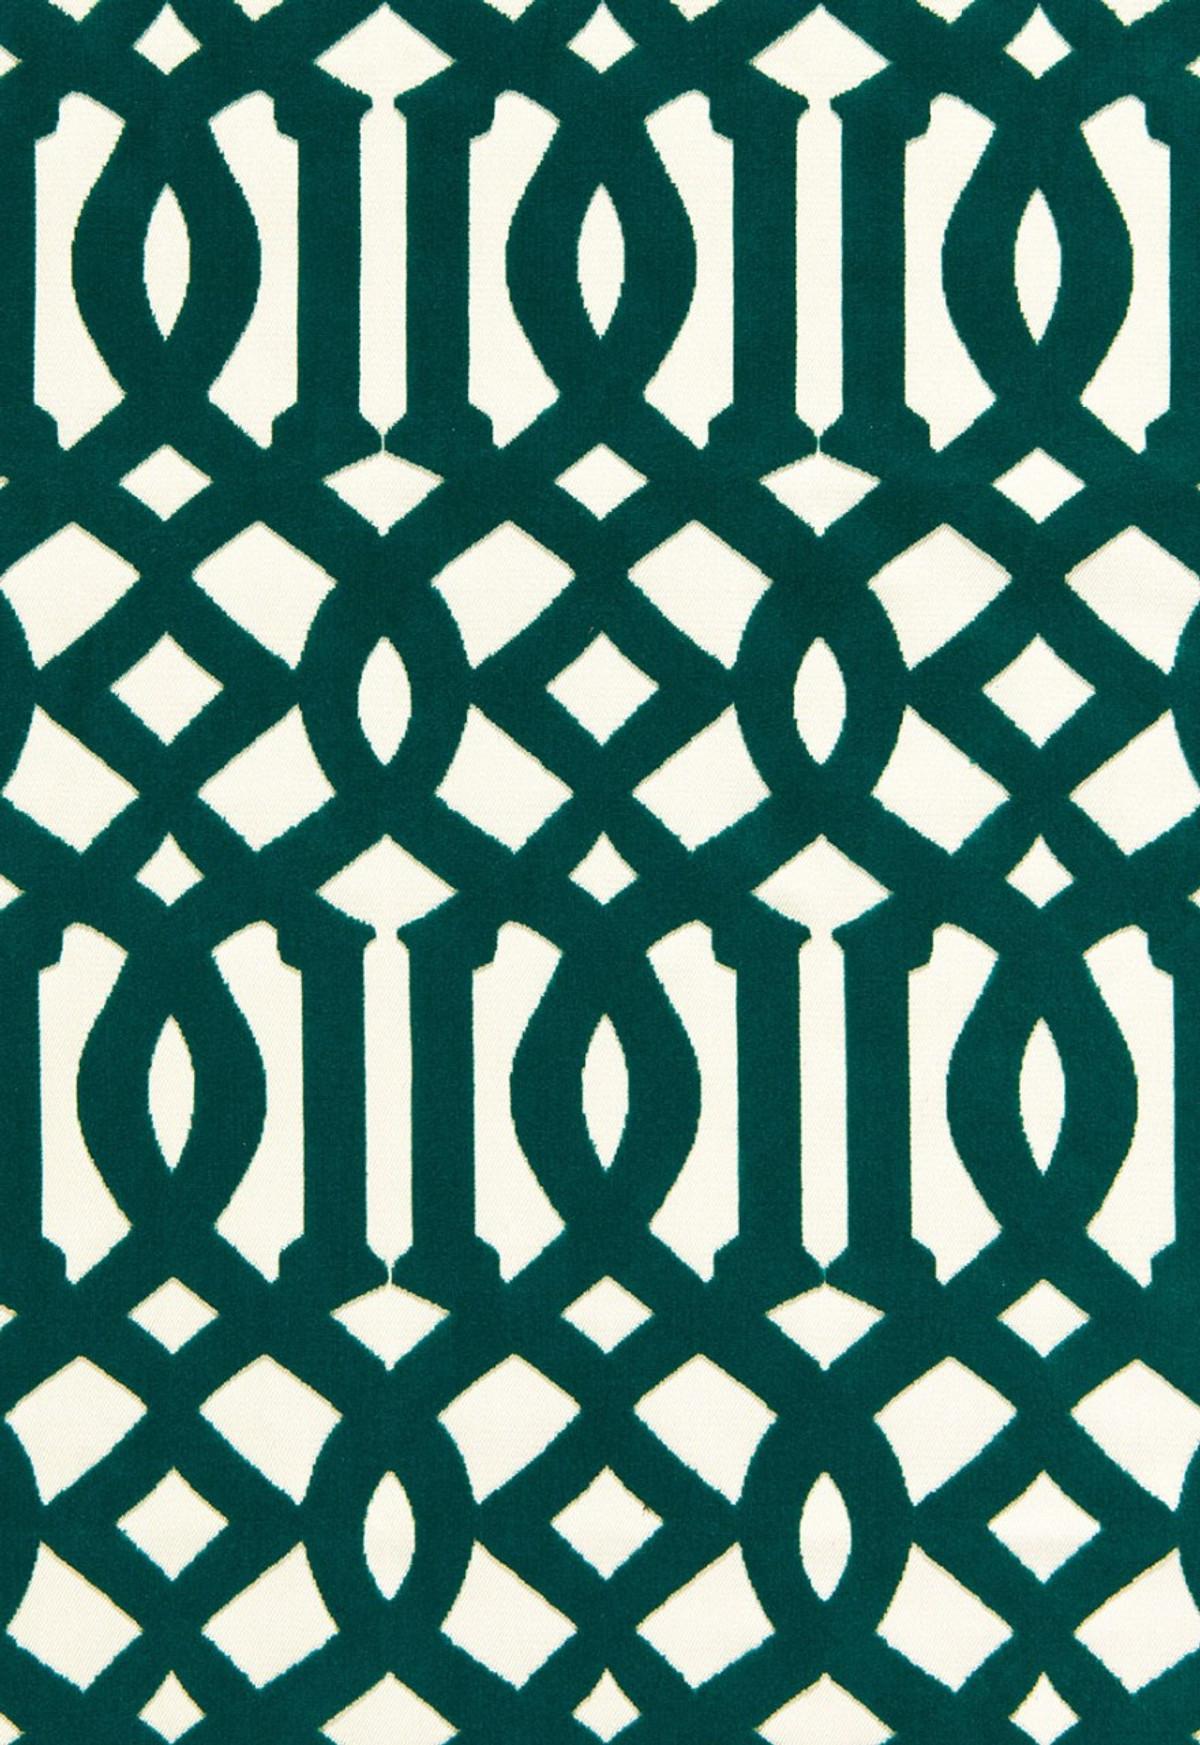 Schumacher imperial trellis velvet chartreuse 65591 for Imperial printing